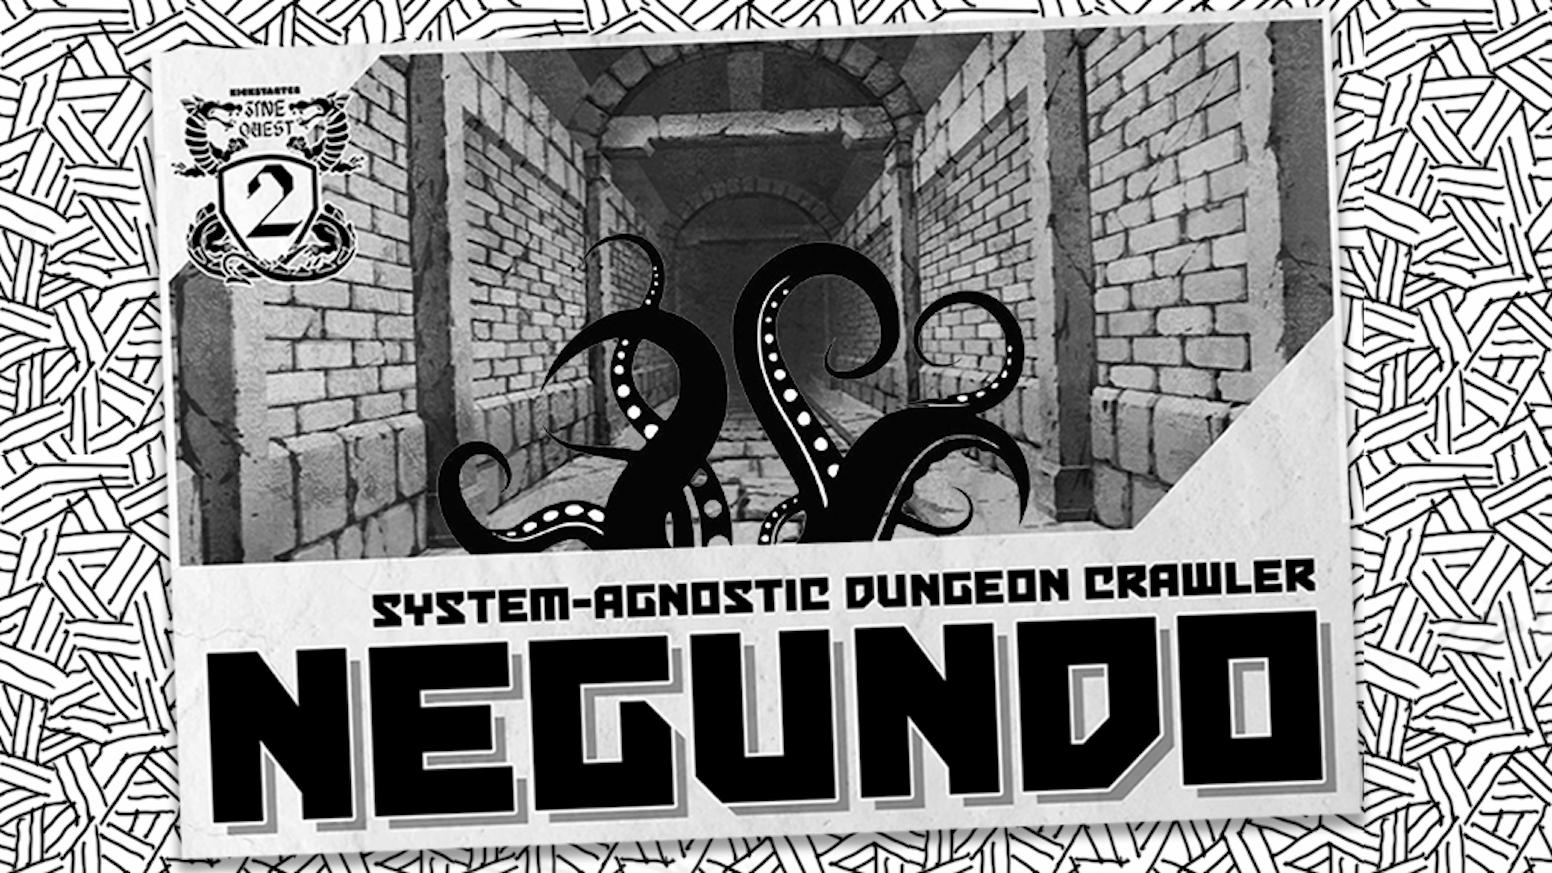 A system agnostic dungeon crawler zine